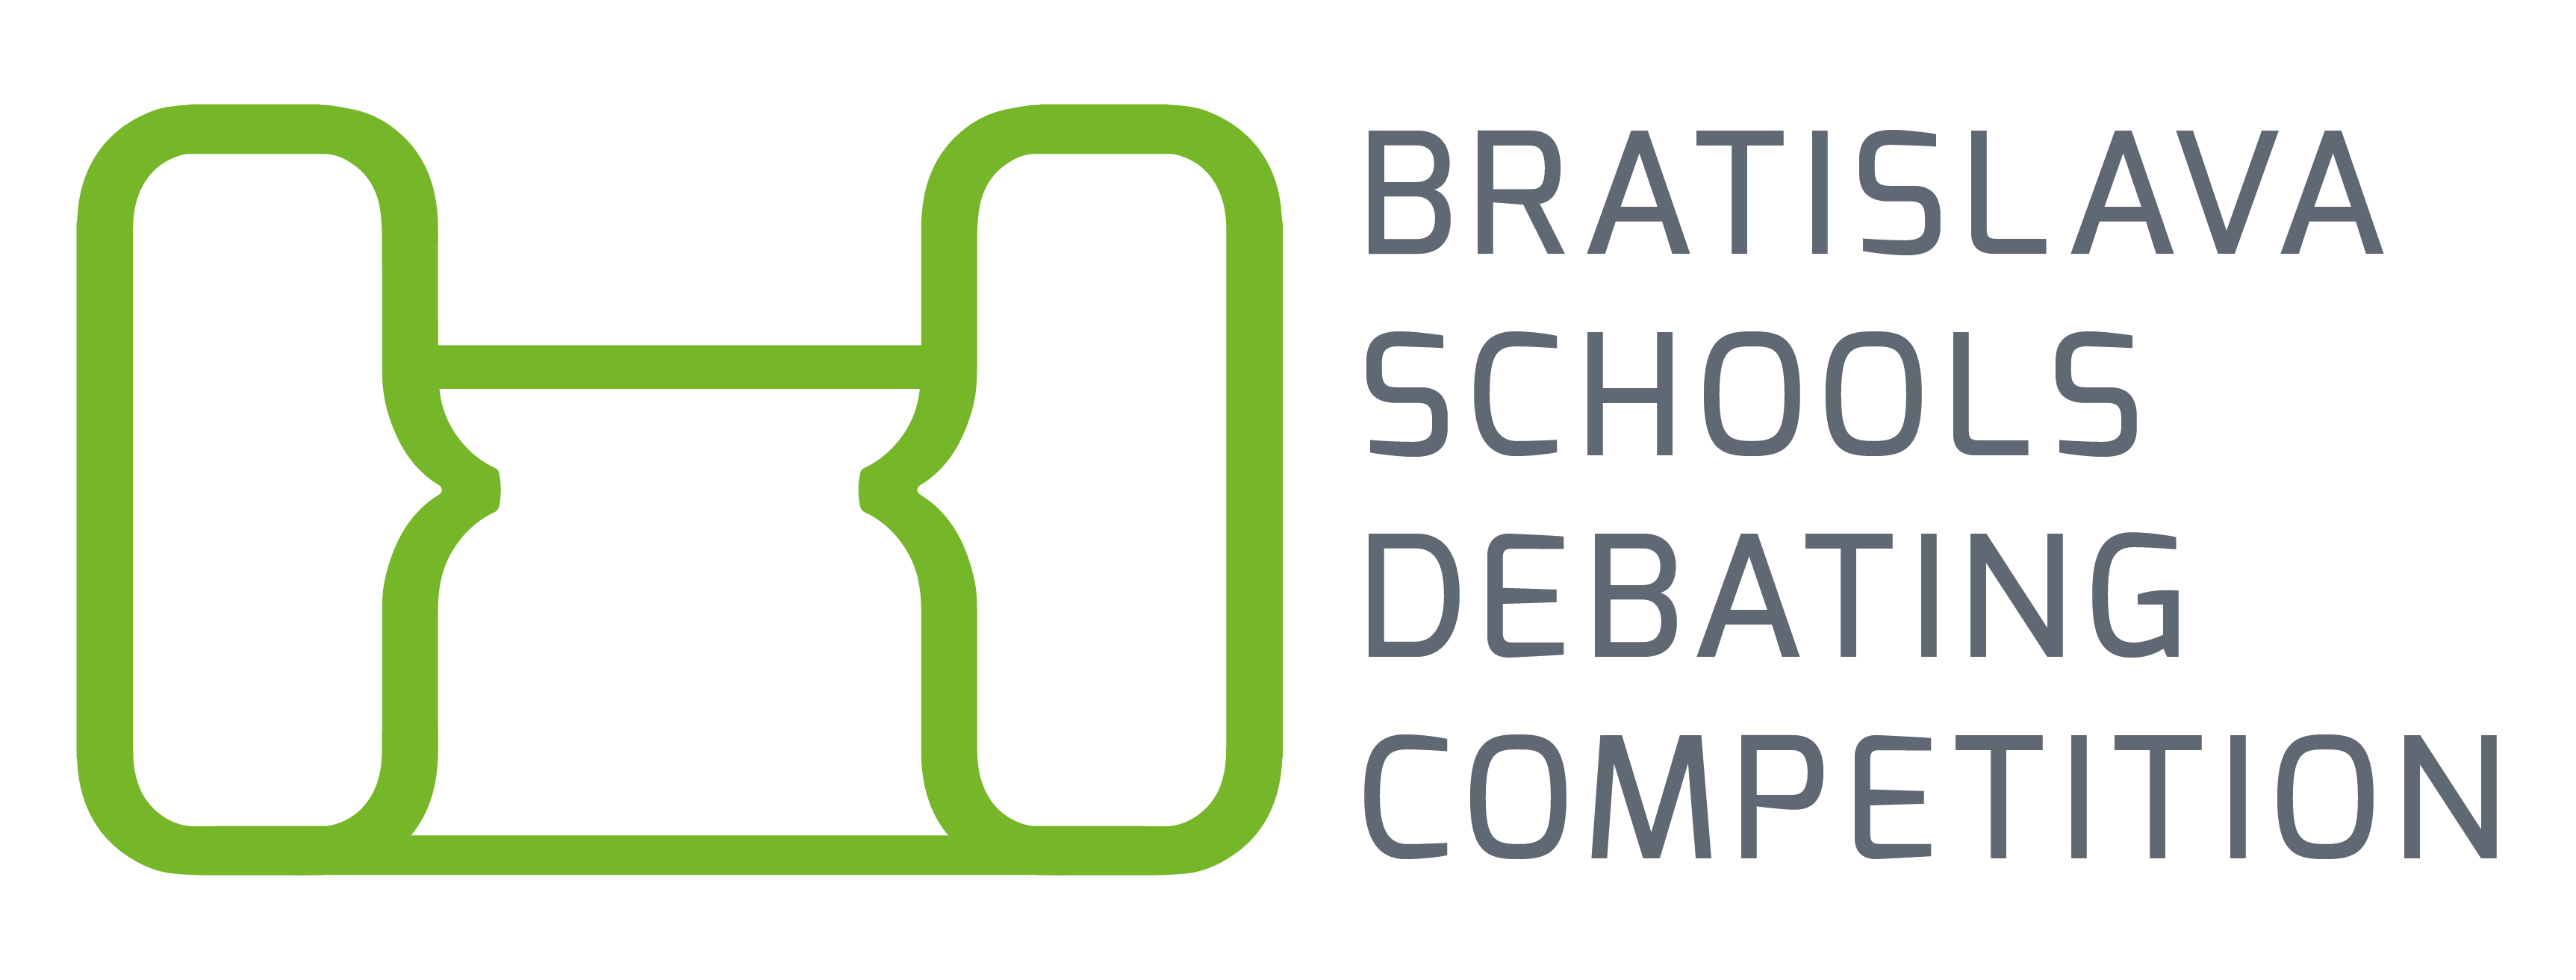 Bratislava Schools Debating Competiton